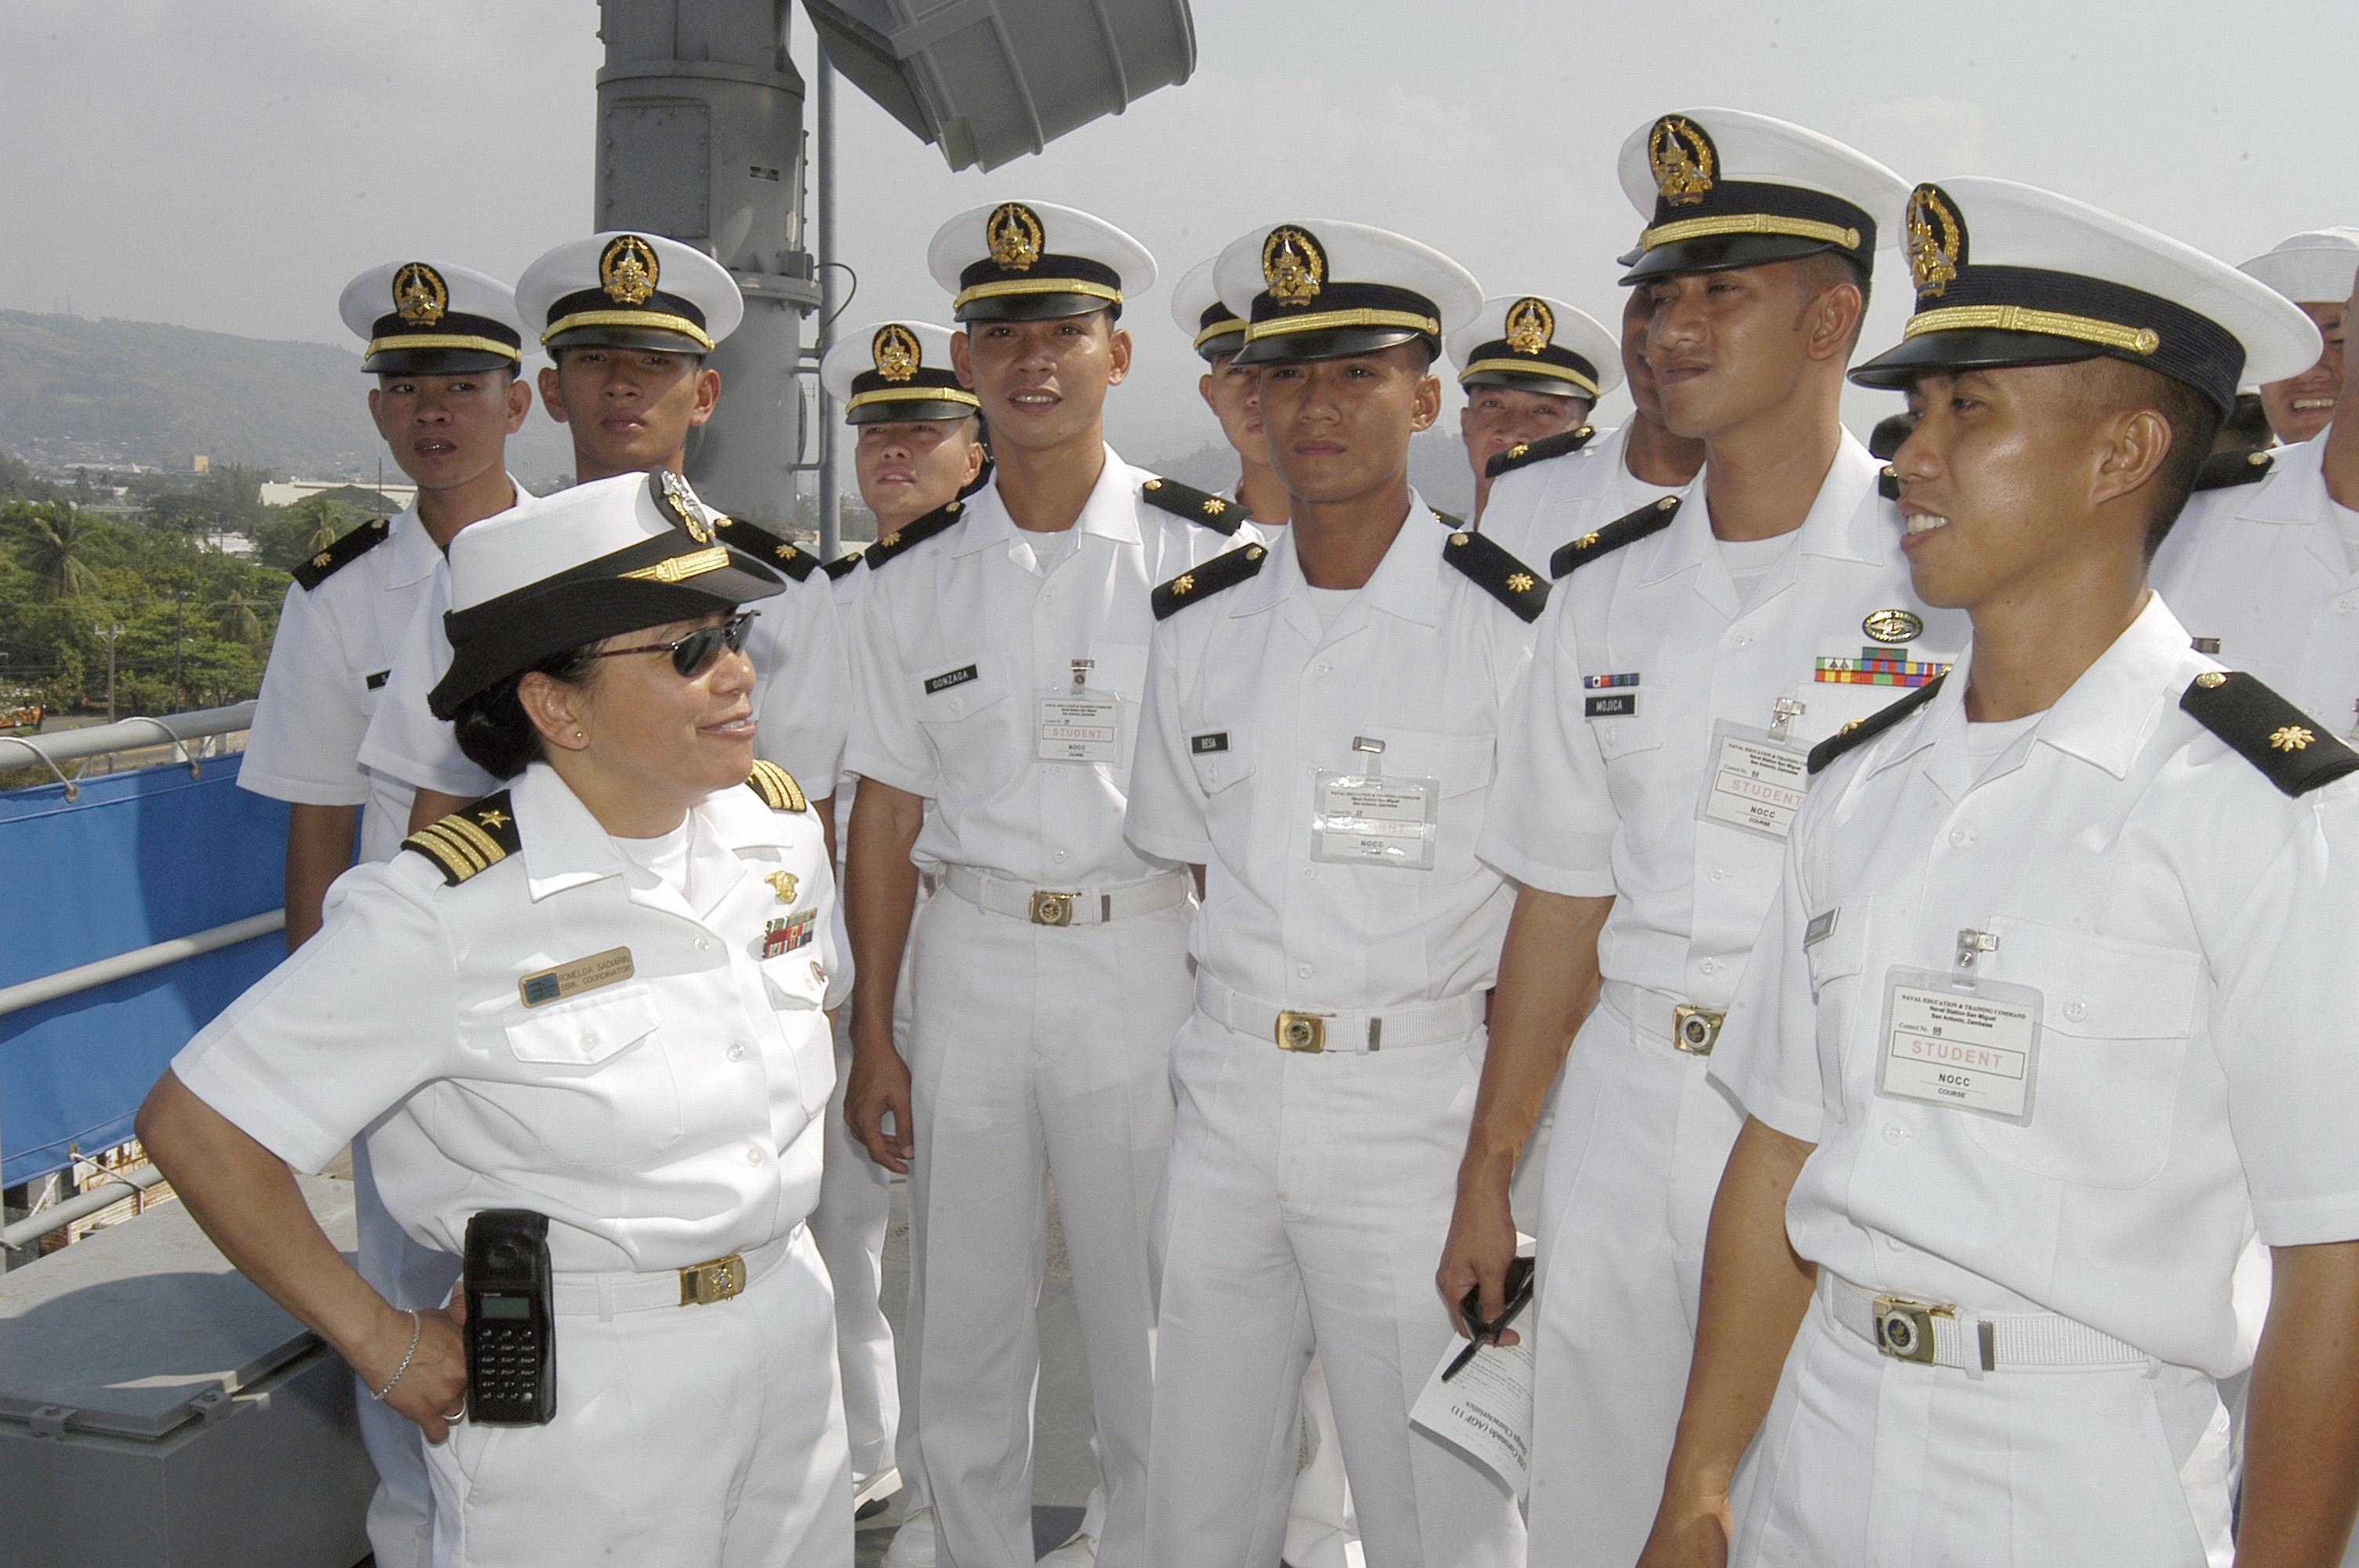 File:US Navy 040424-N-4055P-004 Lt. Cmdr. Romelda Sadiarin